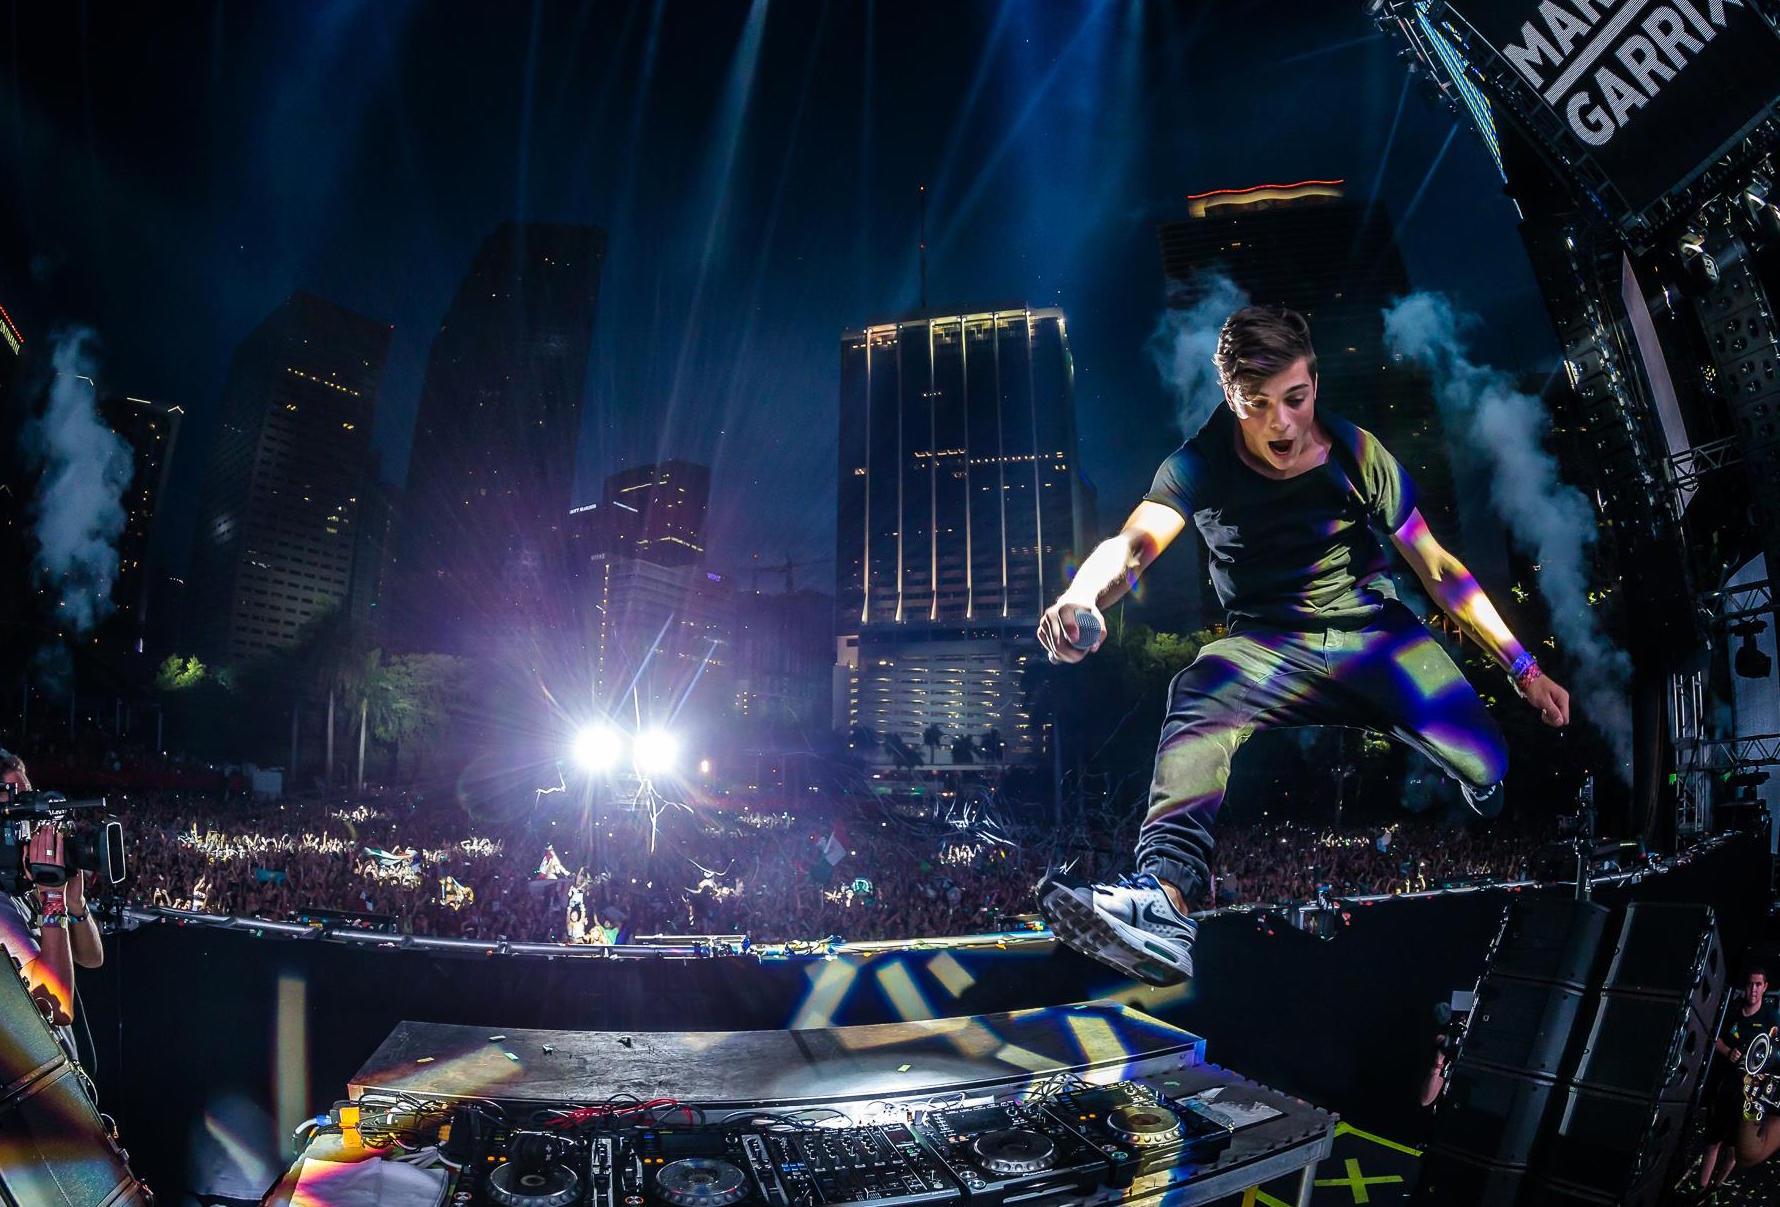 See Martin Garrix Live in Las Vegas